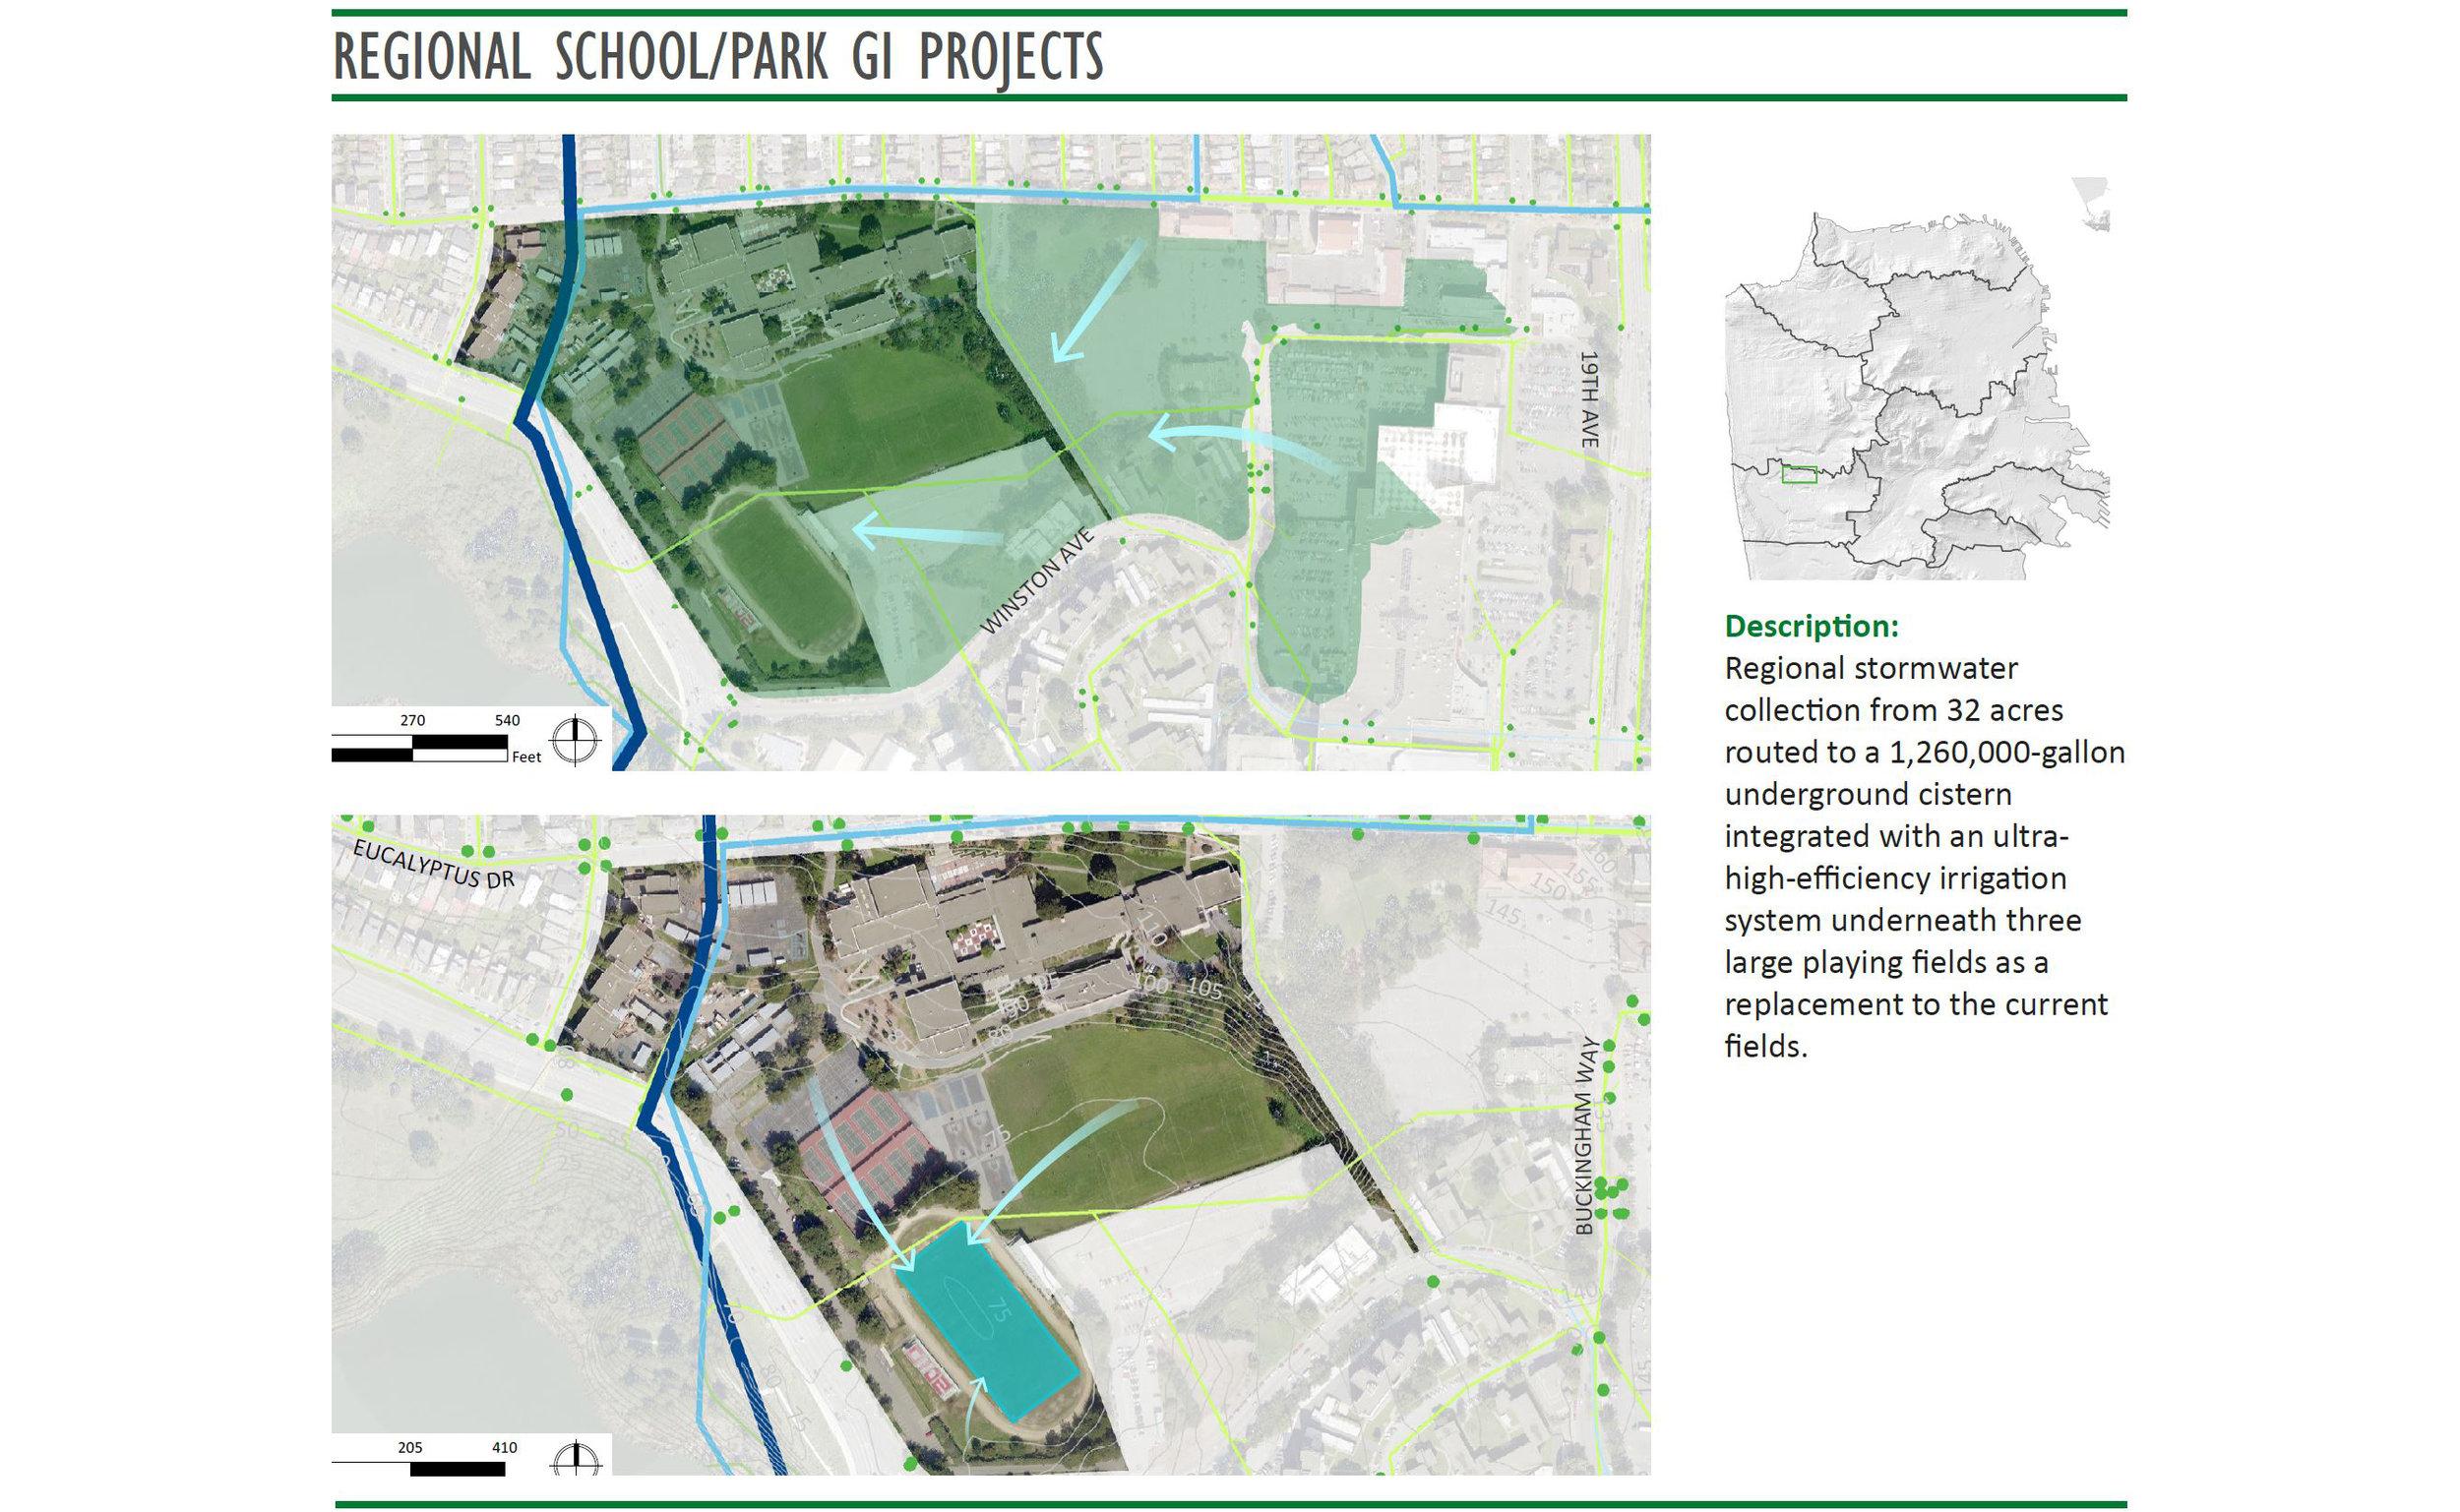 regional park/school project concept